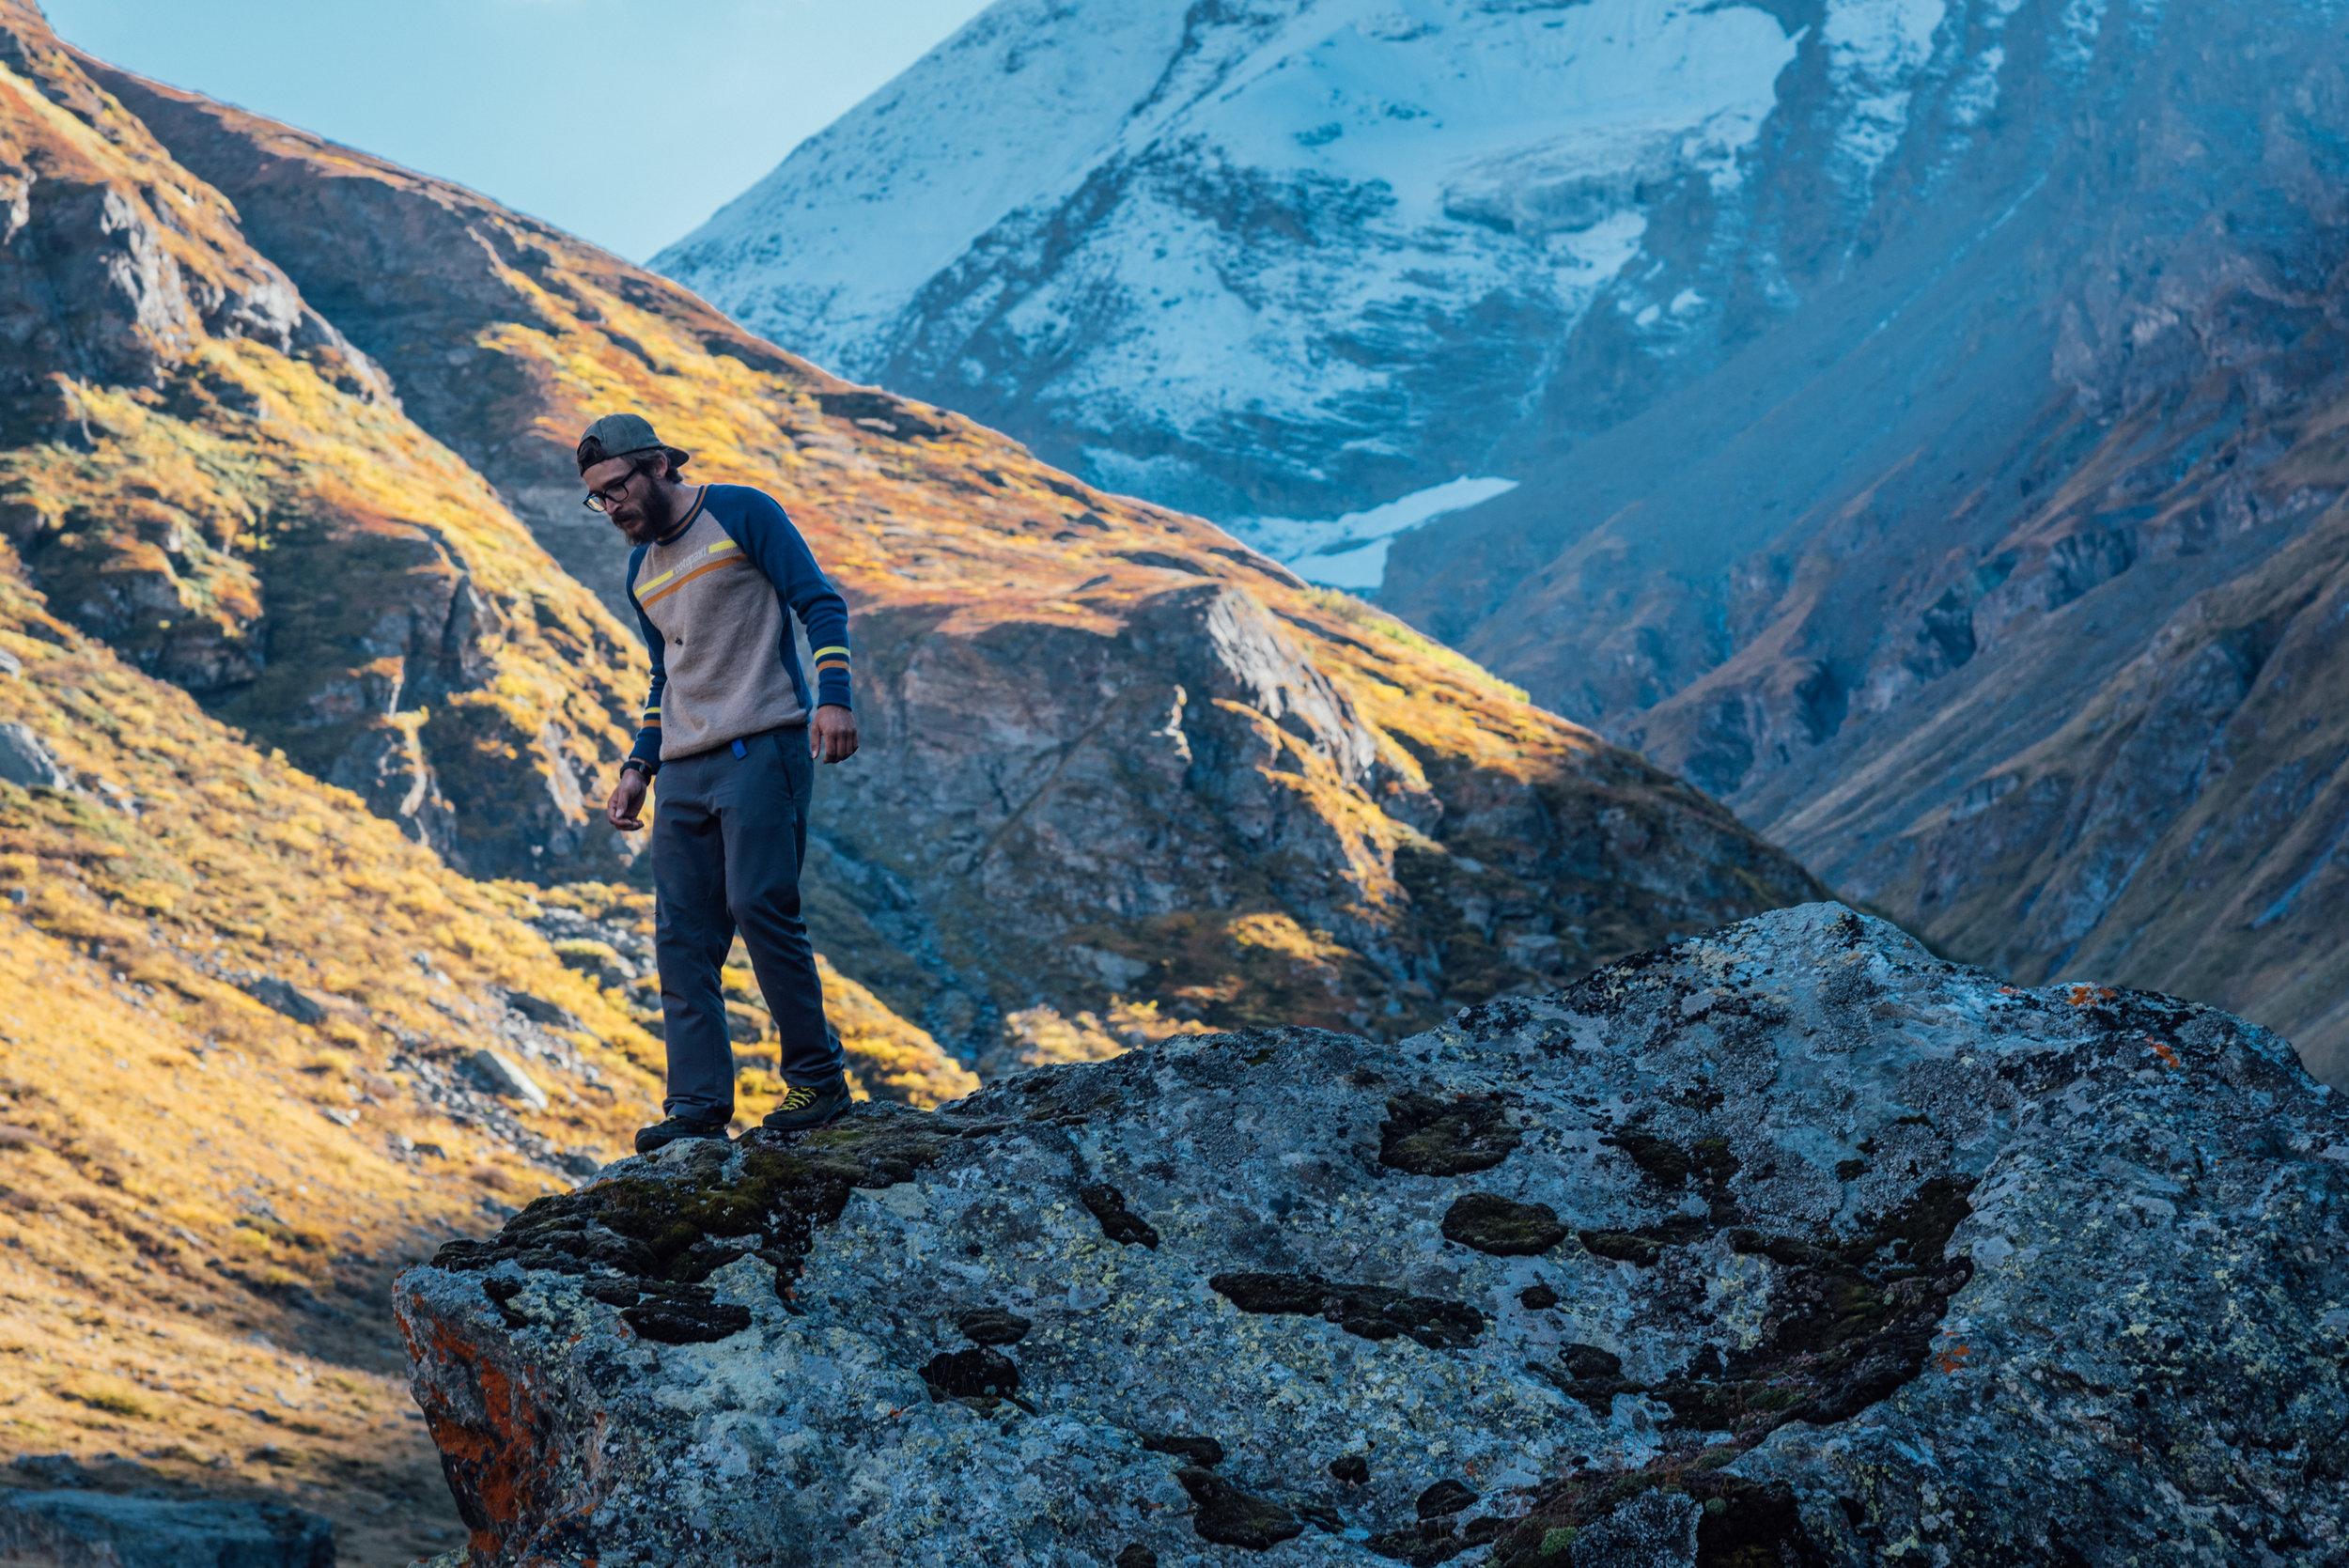 Alps-Fall2016-D750-61.jpg